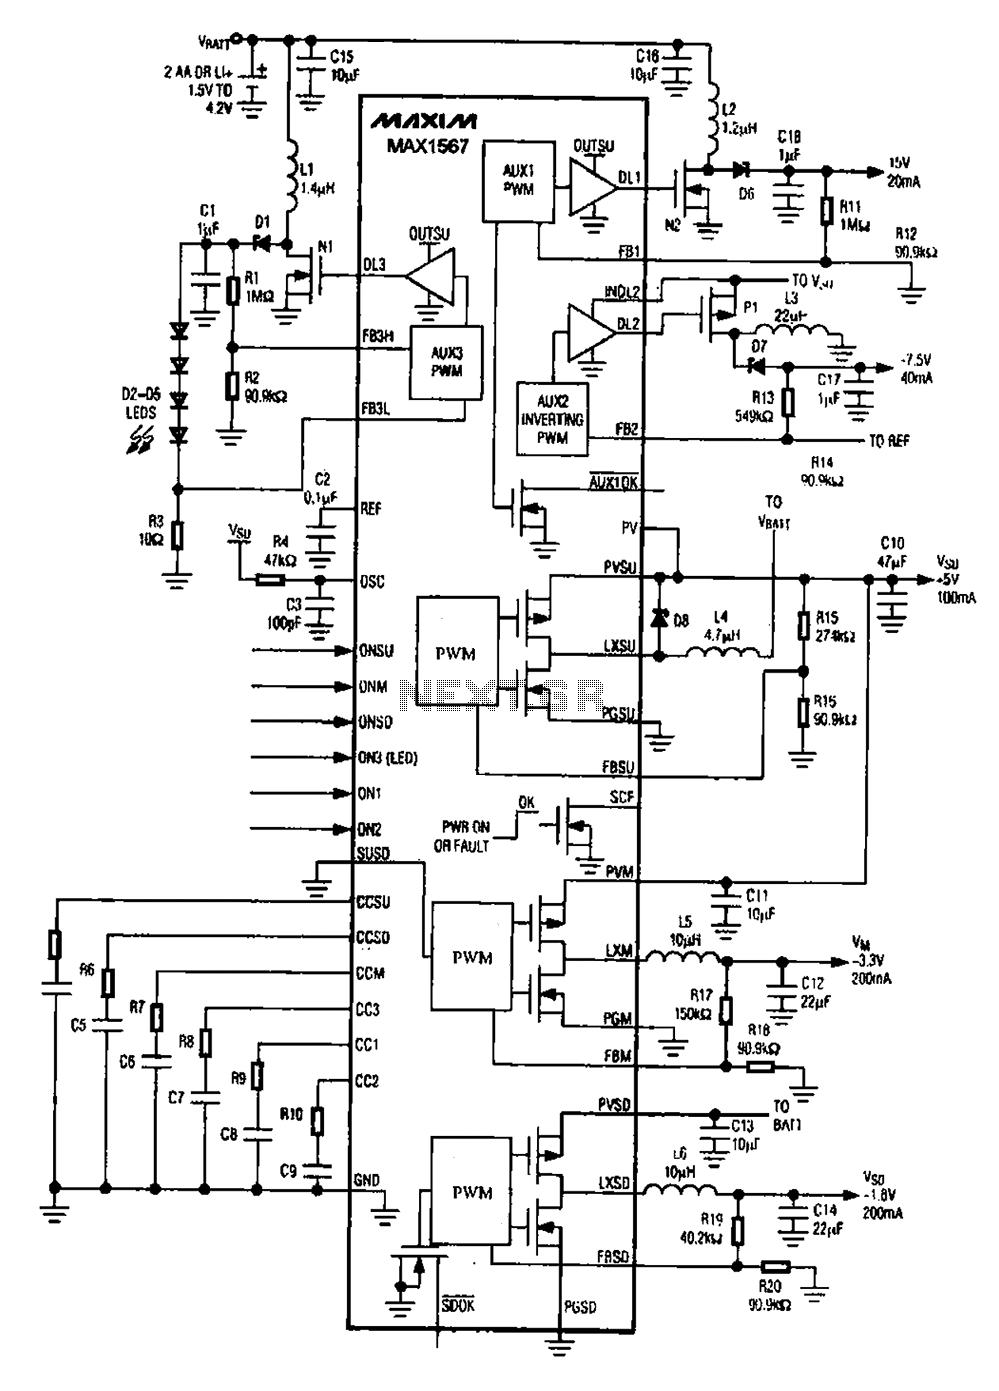 2018 dodge journey fuse box diagram